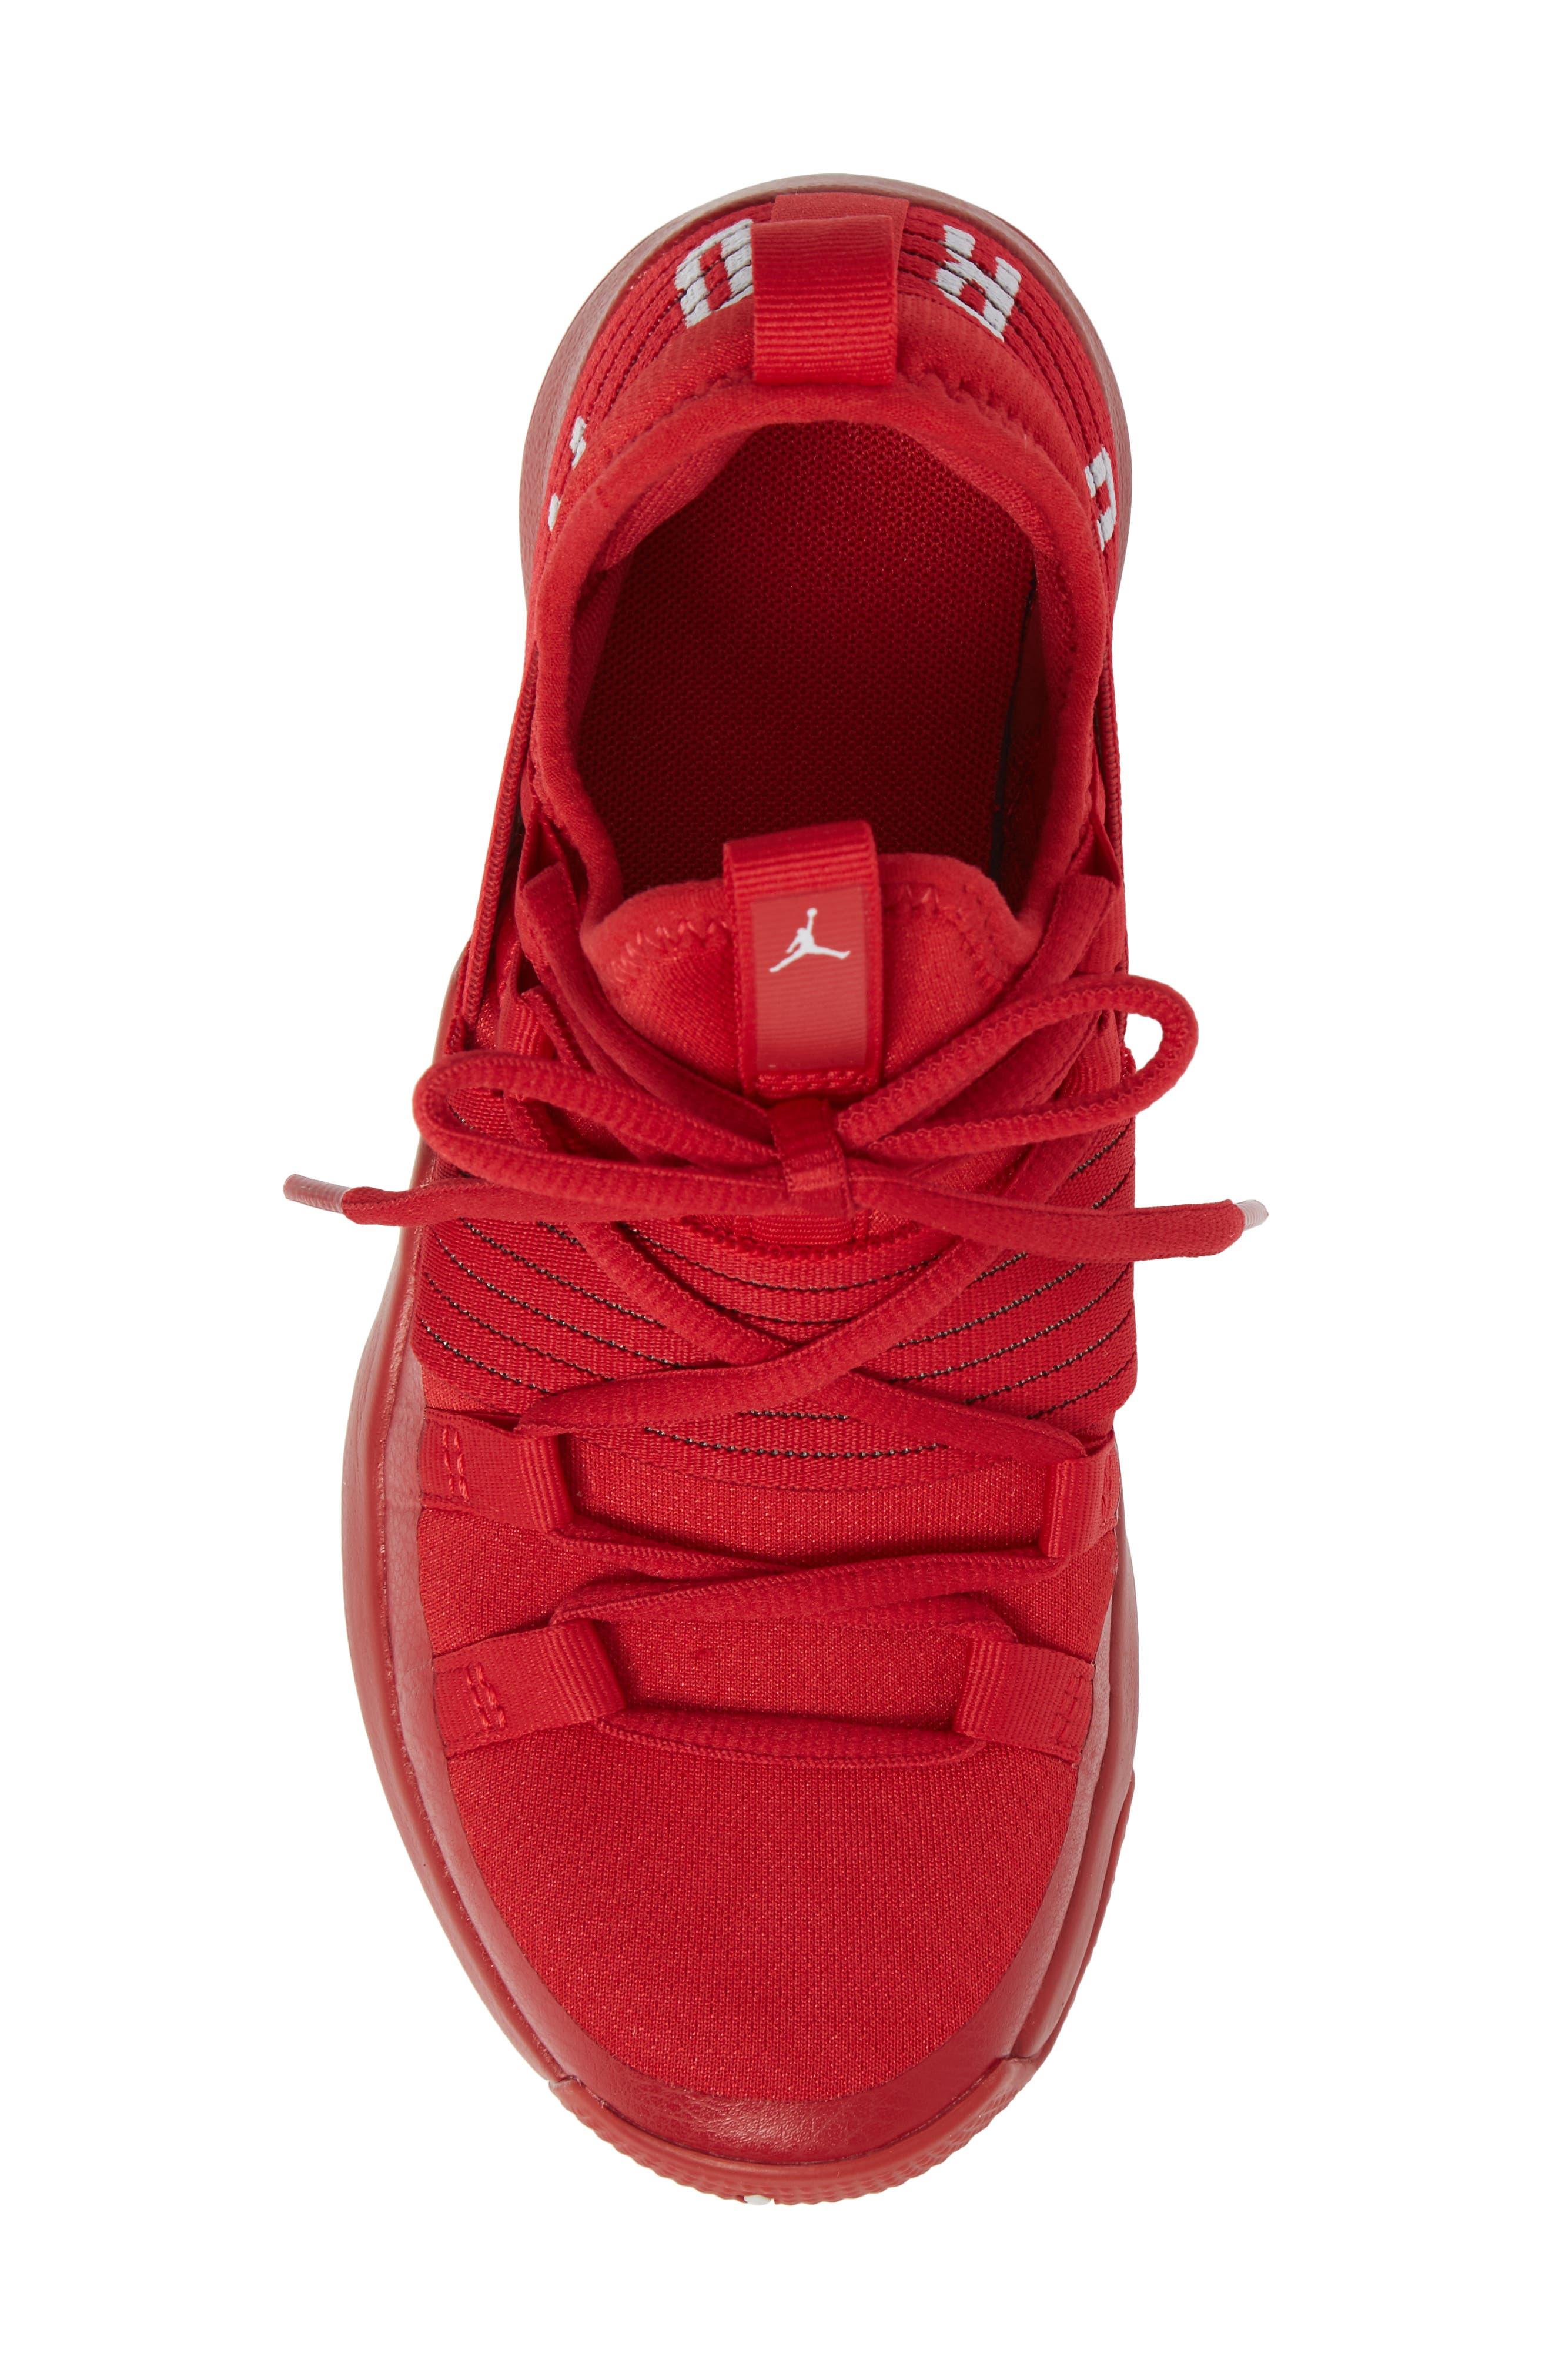 Trainer Pro Training Shoe,                             Alternate thumbnail 5, color,